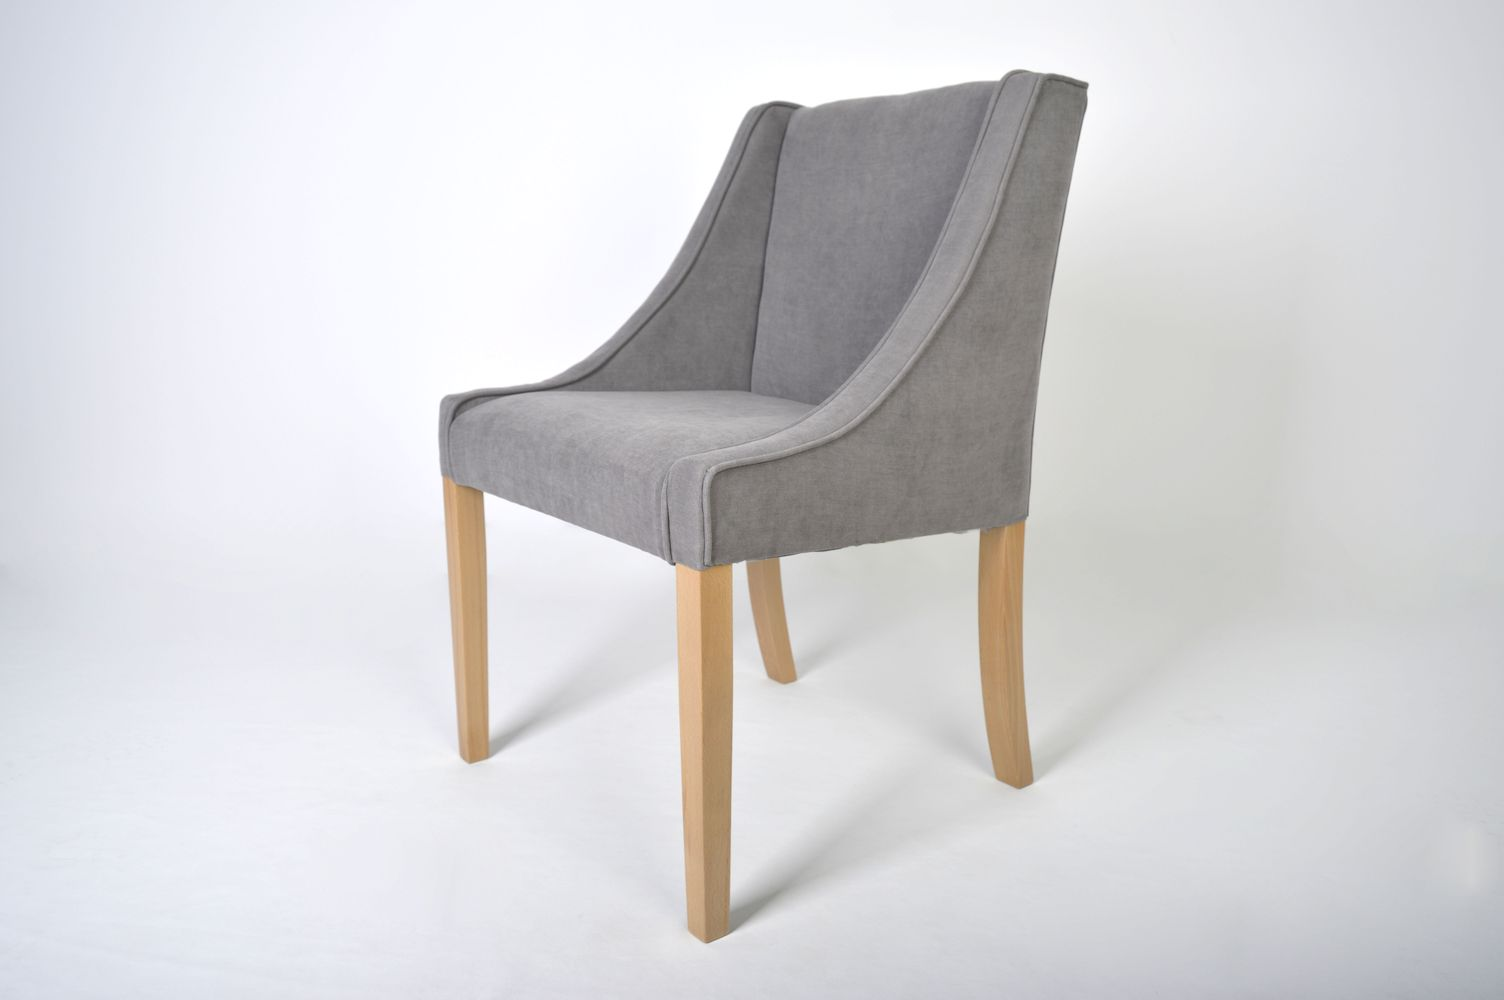 Židle Orelia- různé barvy